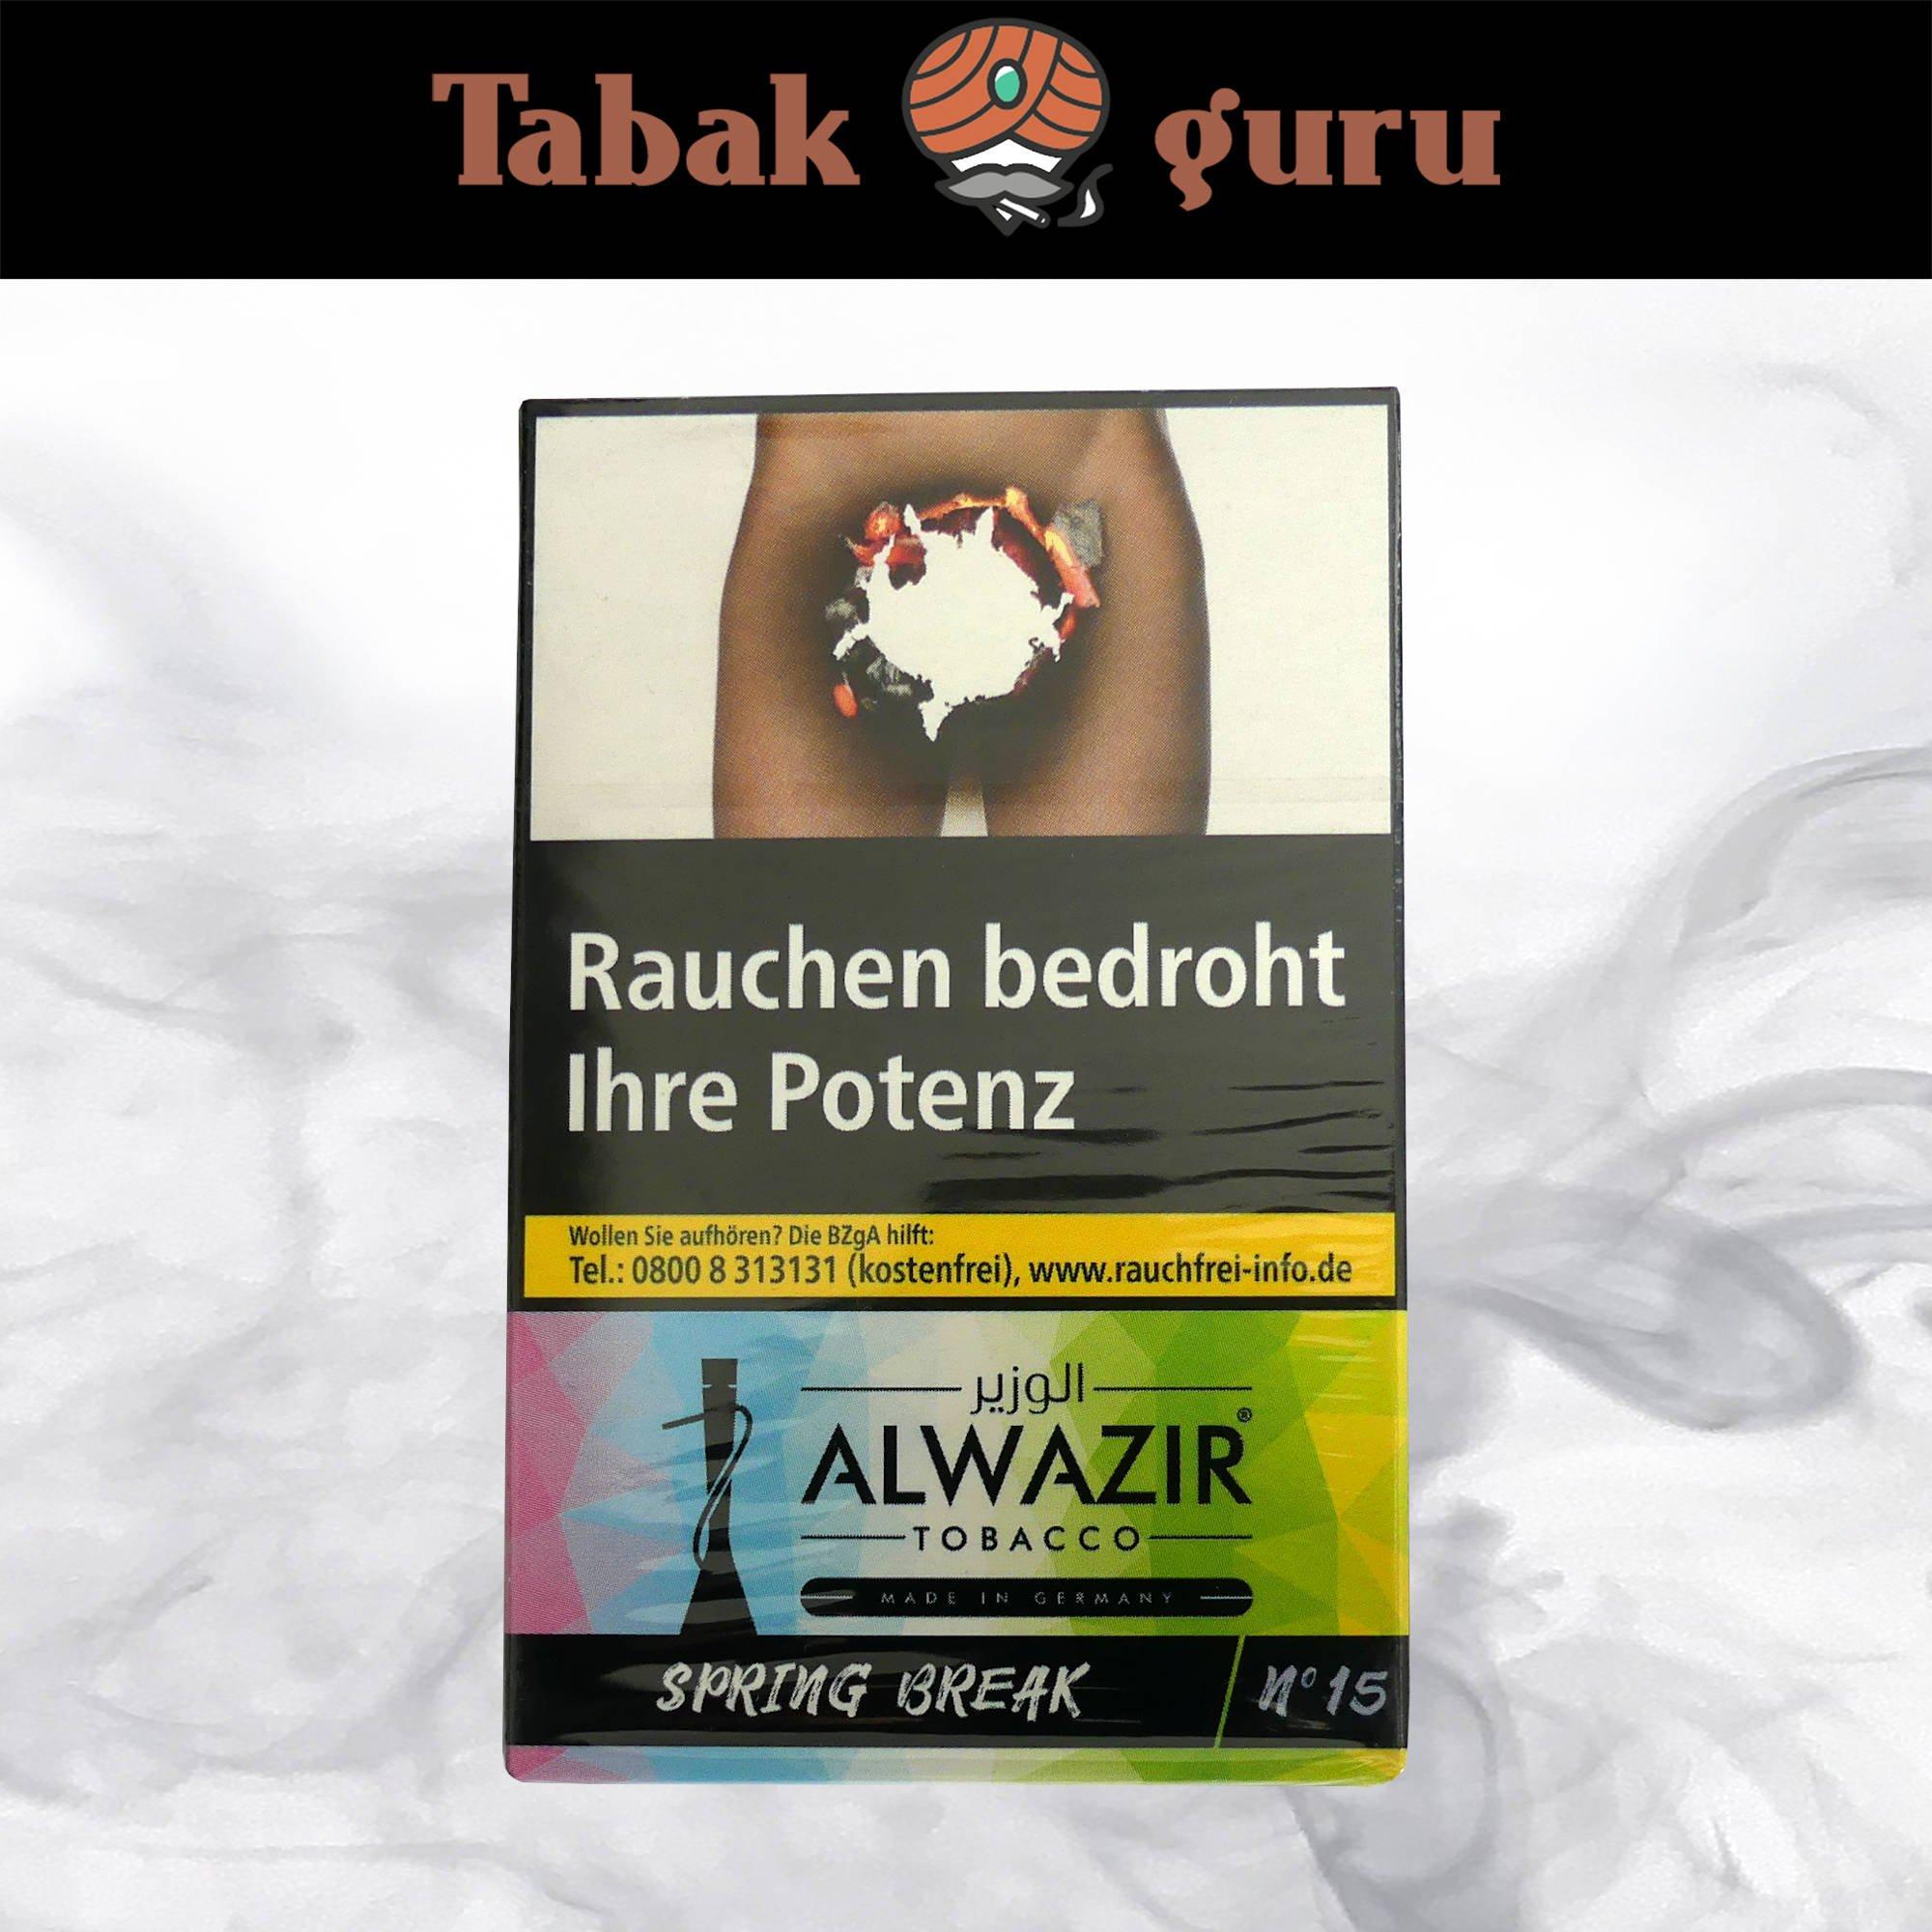 Alwazir Shisha Tabak - No. 15 - SPRING BREAK 50g